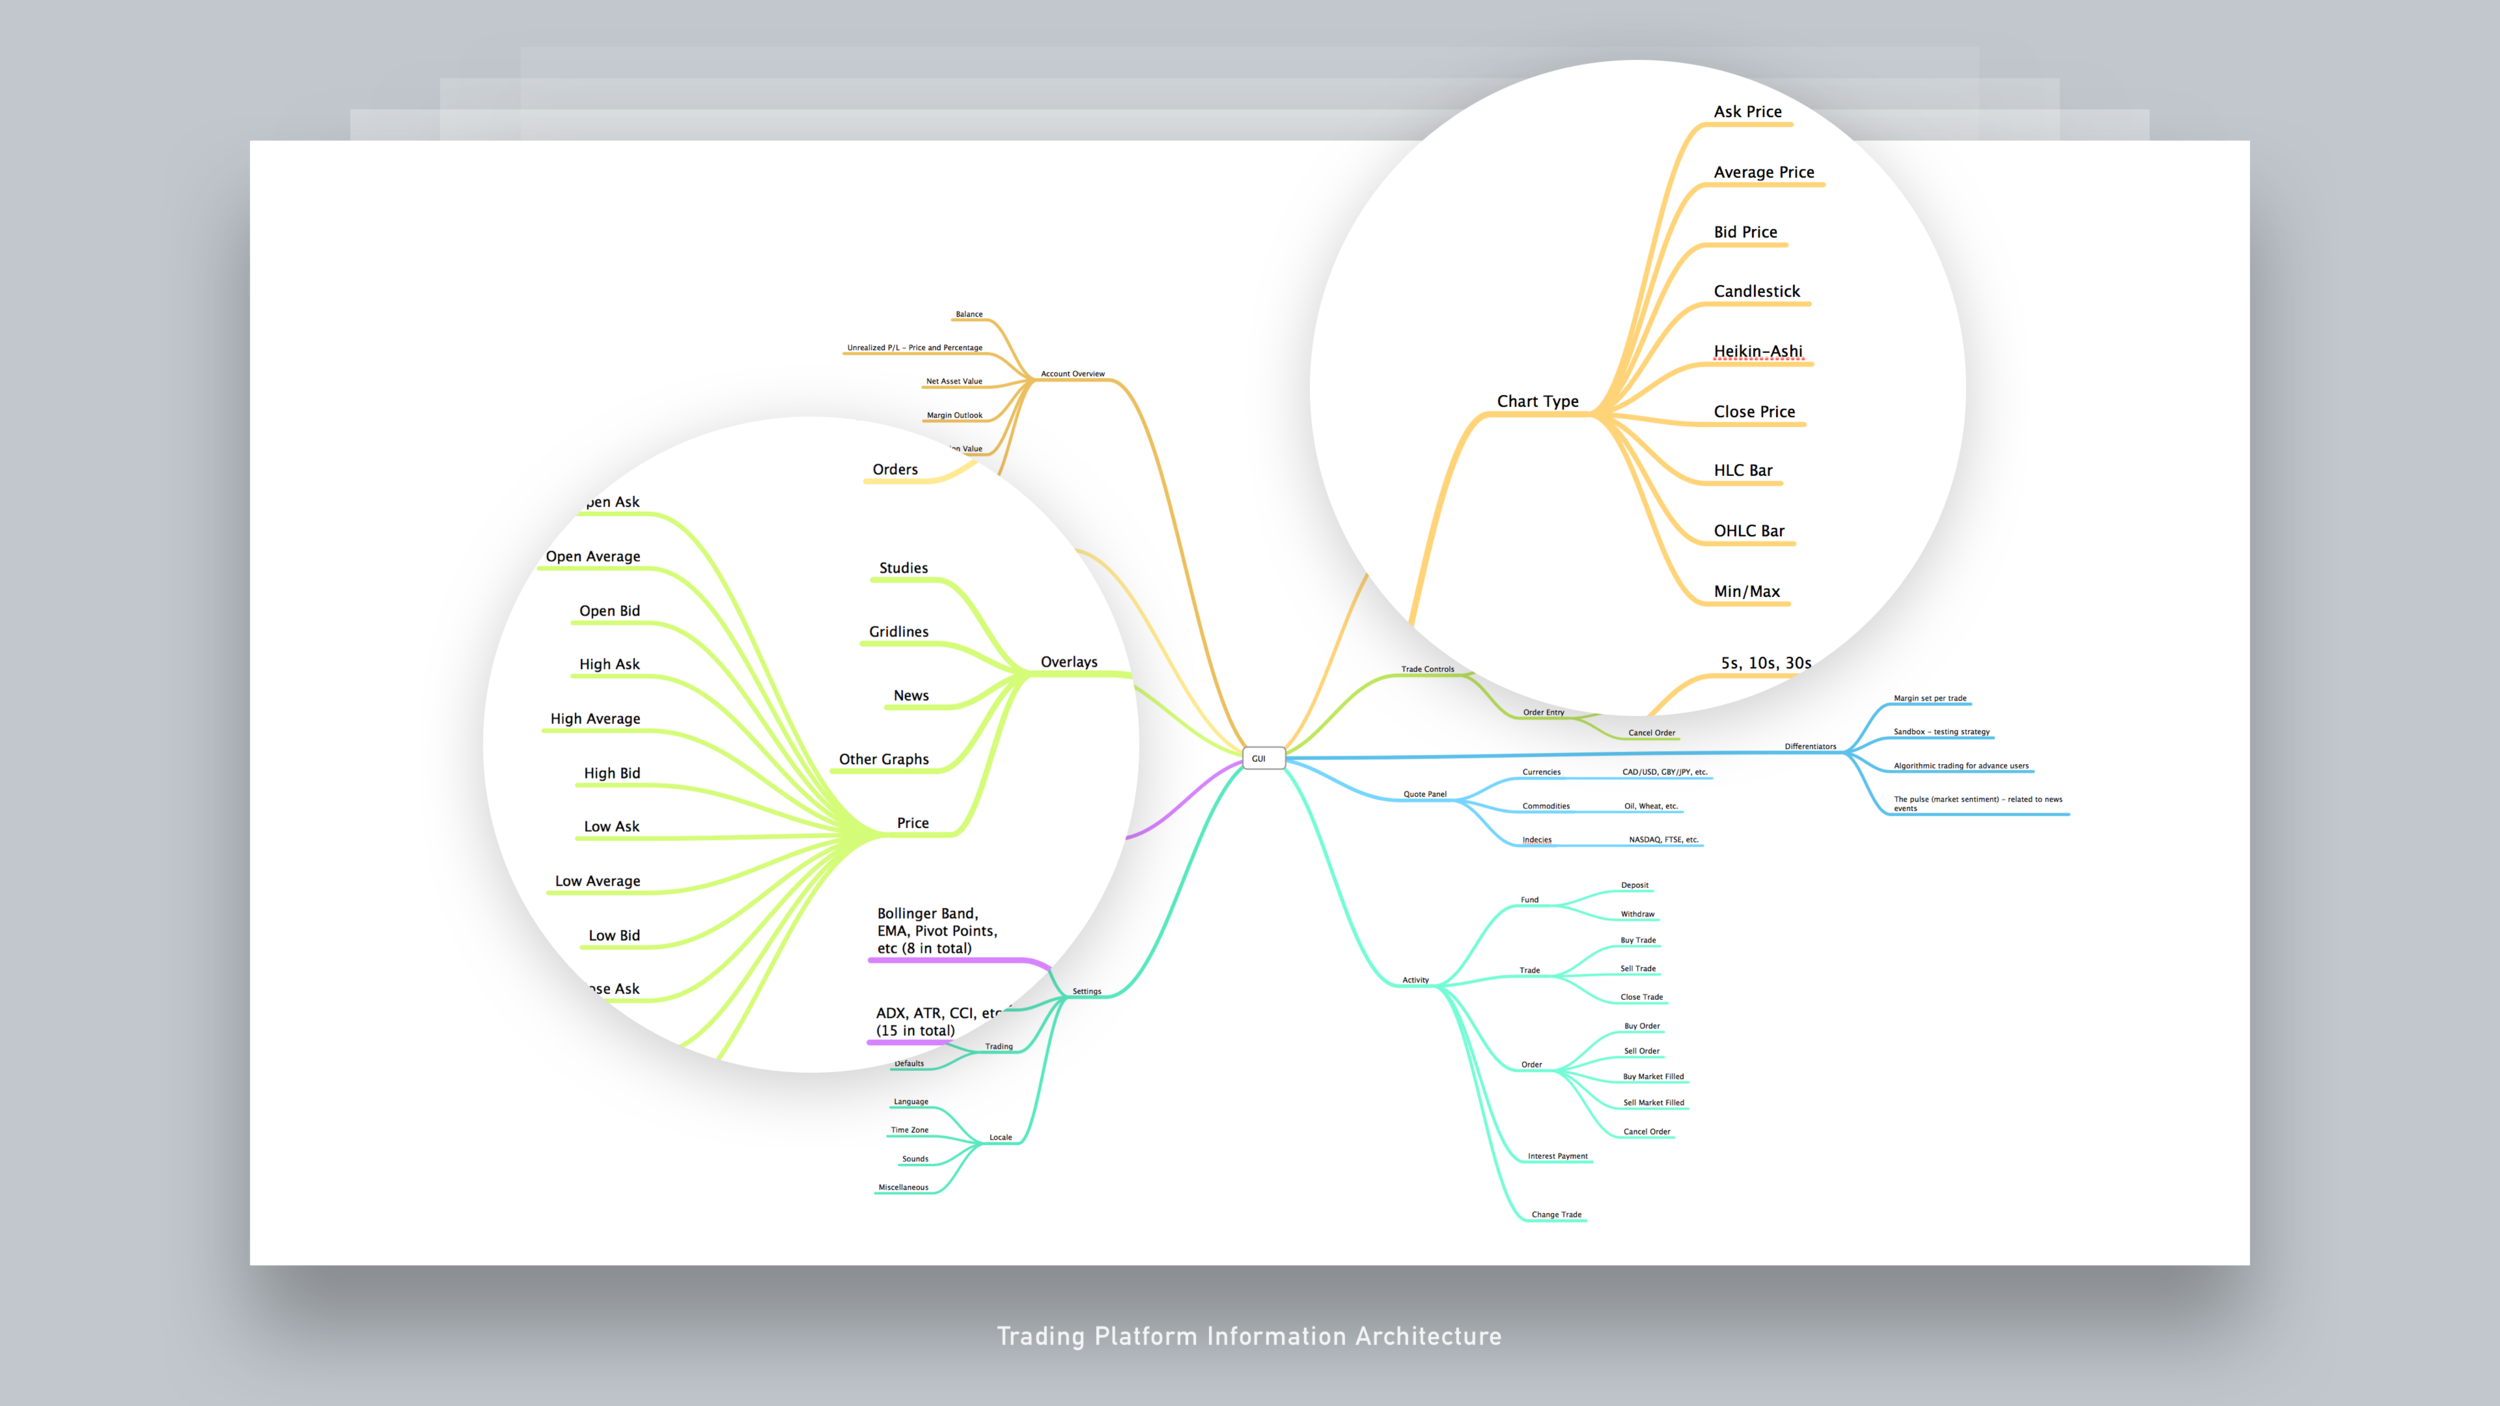 08 Information Architecture - Forex Trading Platform.png